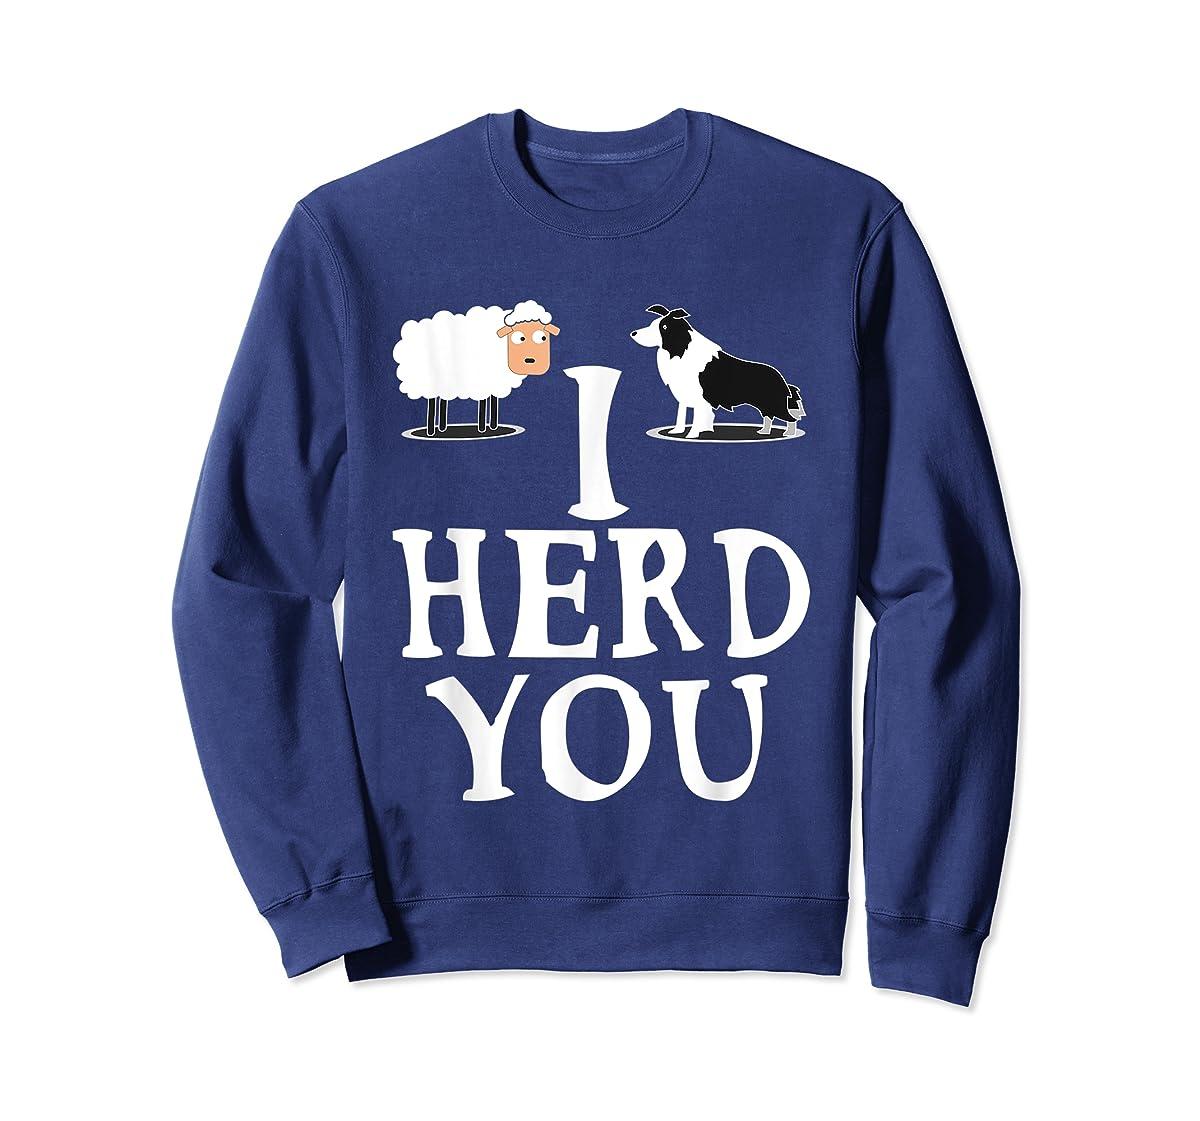 I HERD YOU BORDER COLLIE T shirt Gifts for Men Women Kids-Sweatshirt-Navy